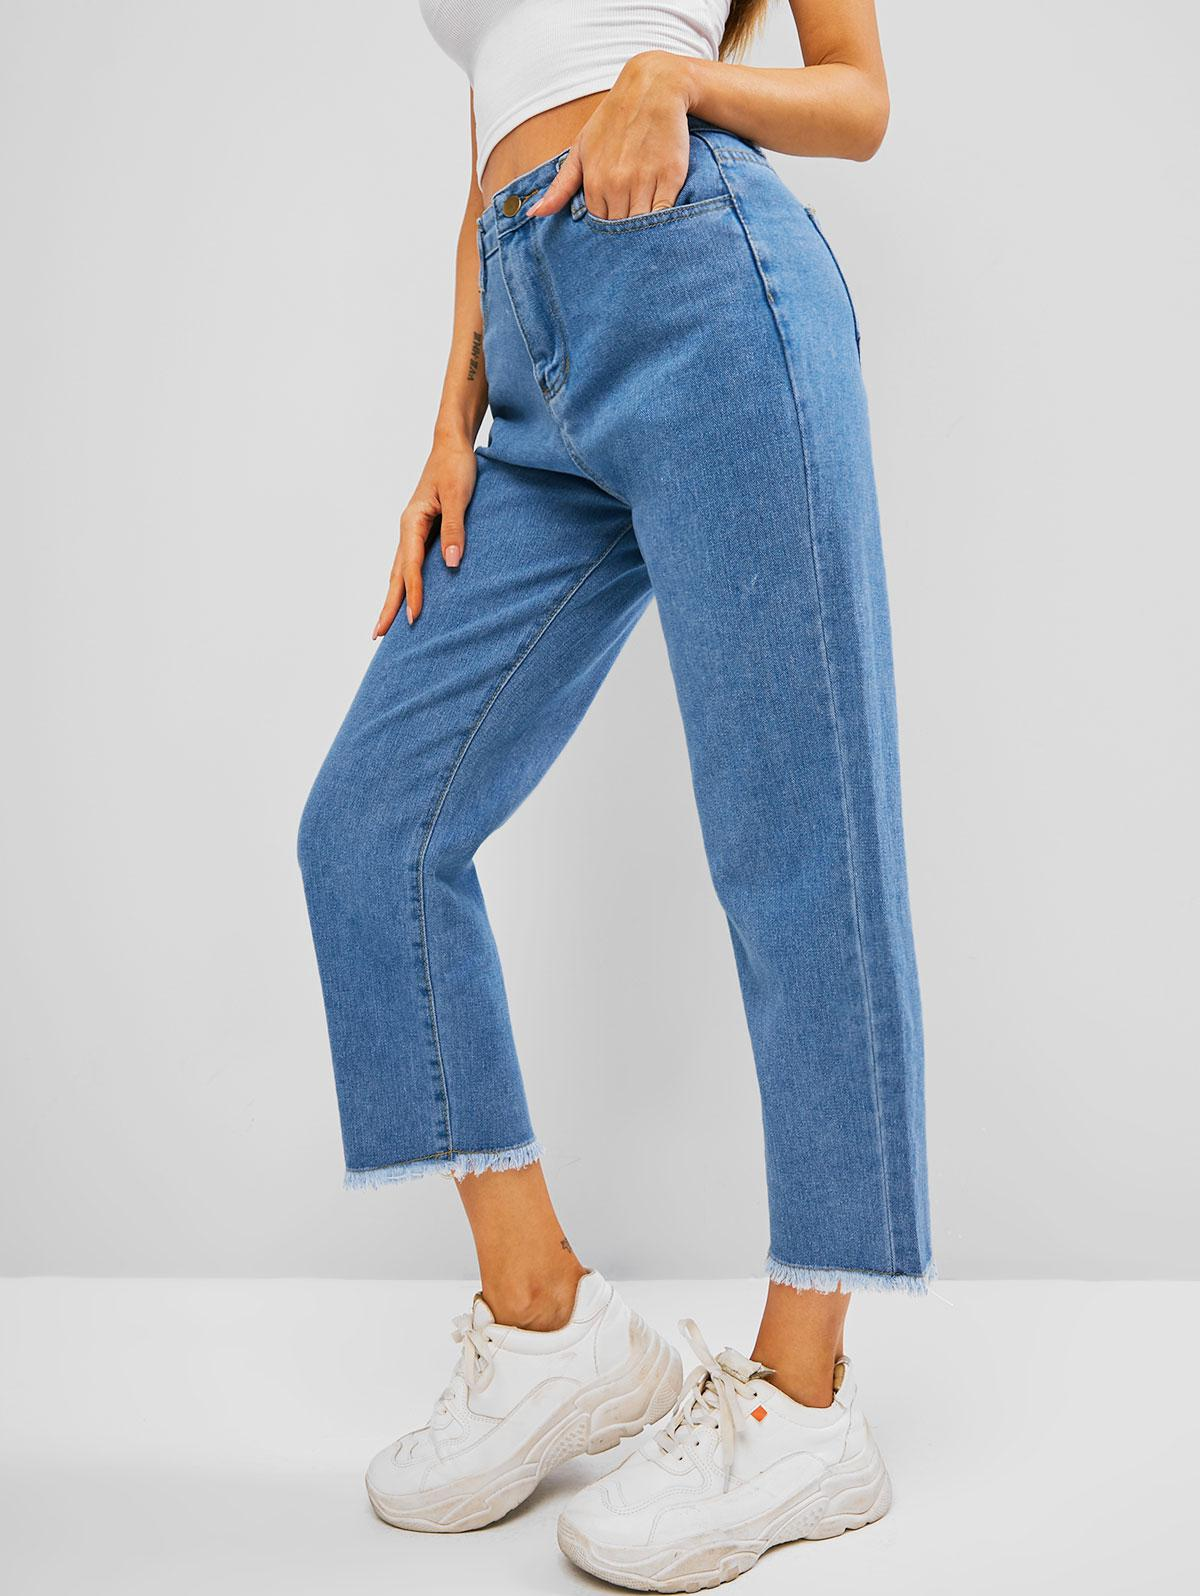 Frayed Hem Pocket High Waisted Straight Jeans